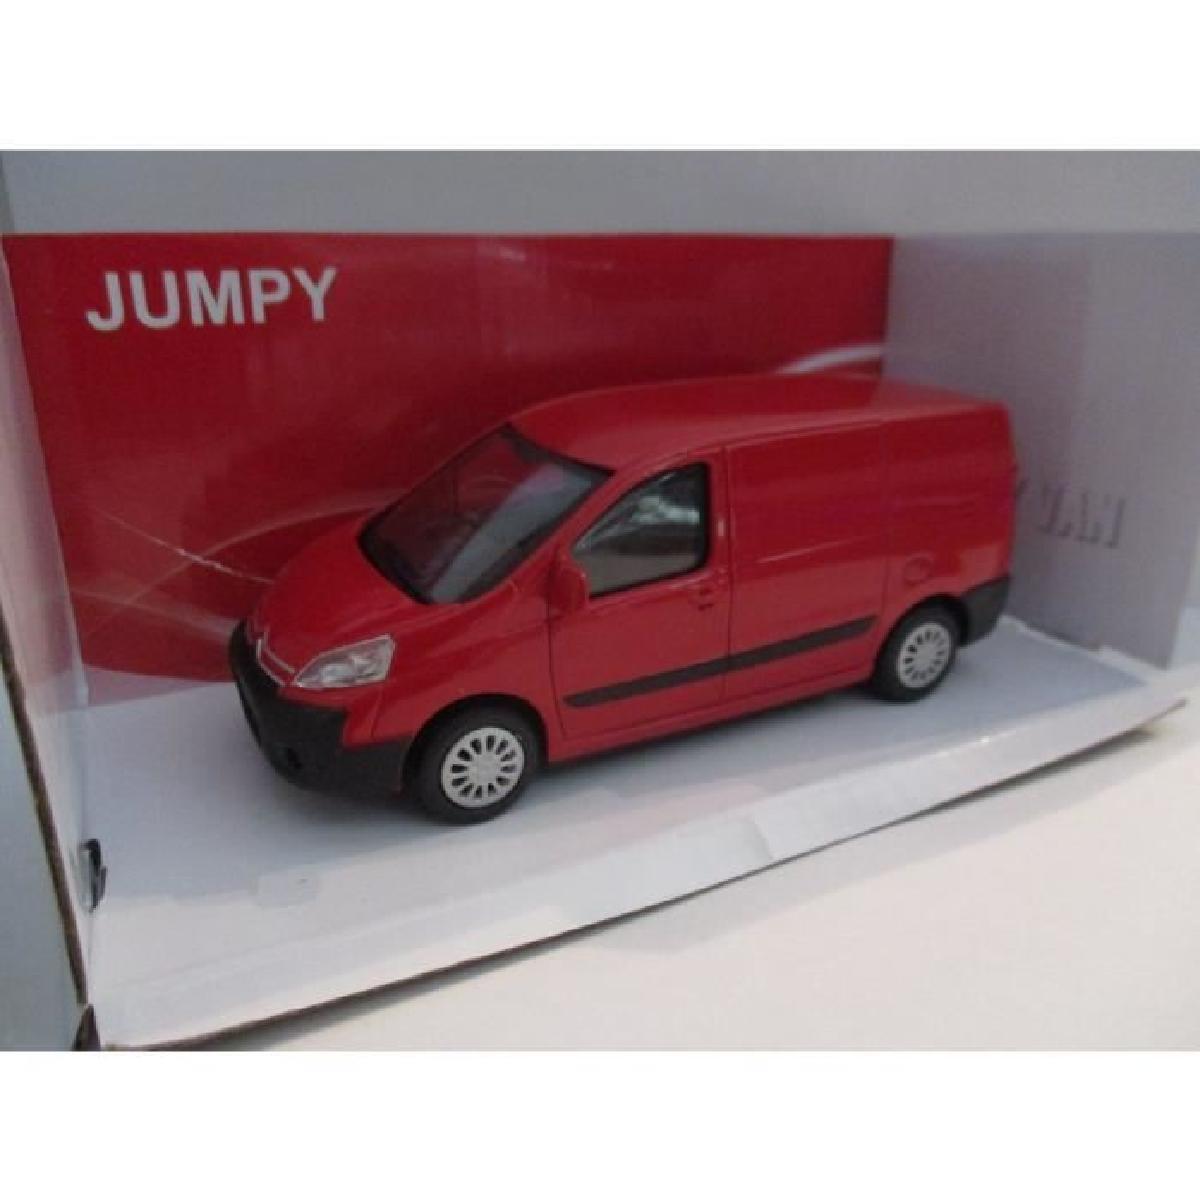 Lot de 3  Citroën Jumpy  Echelle   1 43